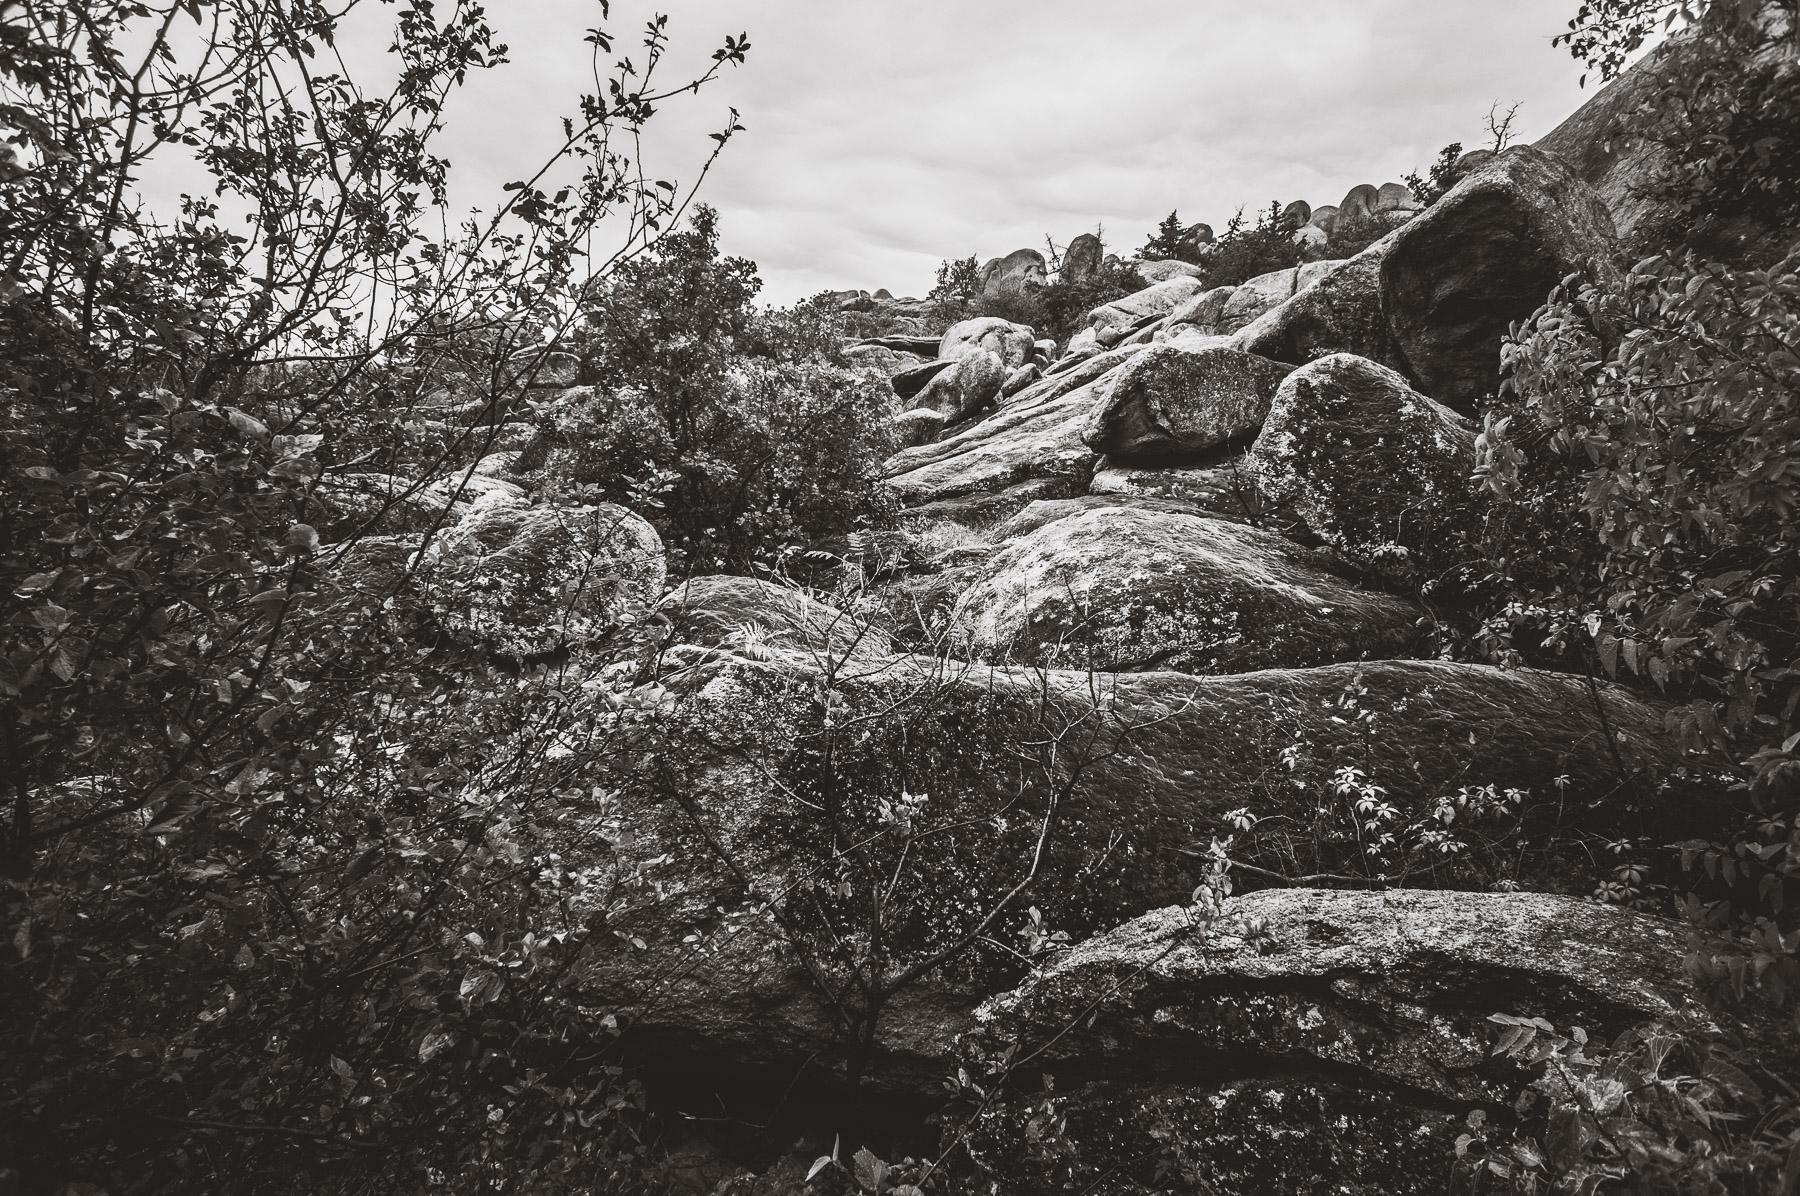 Spanish Cave 11-6-16 (7 of 19).JPG